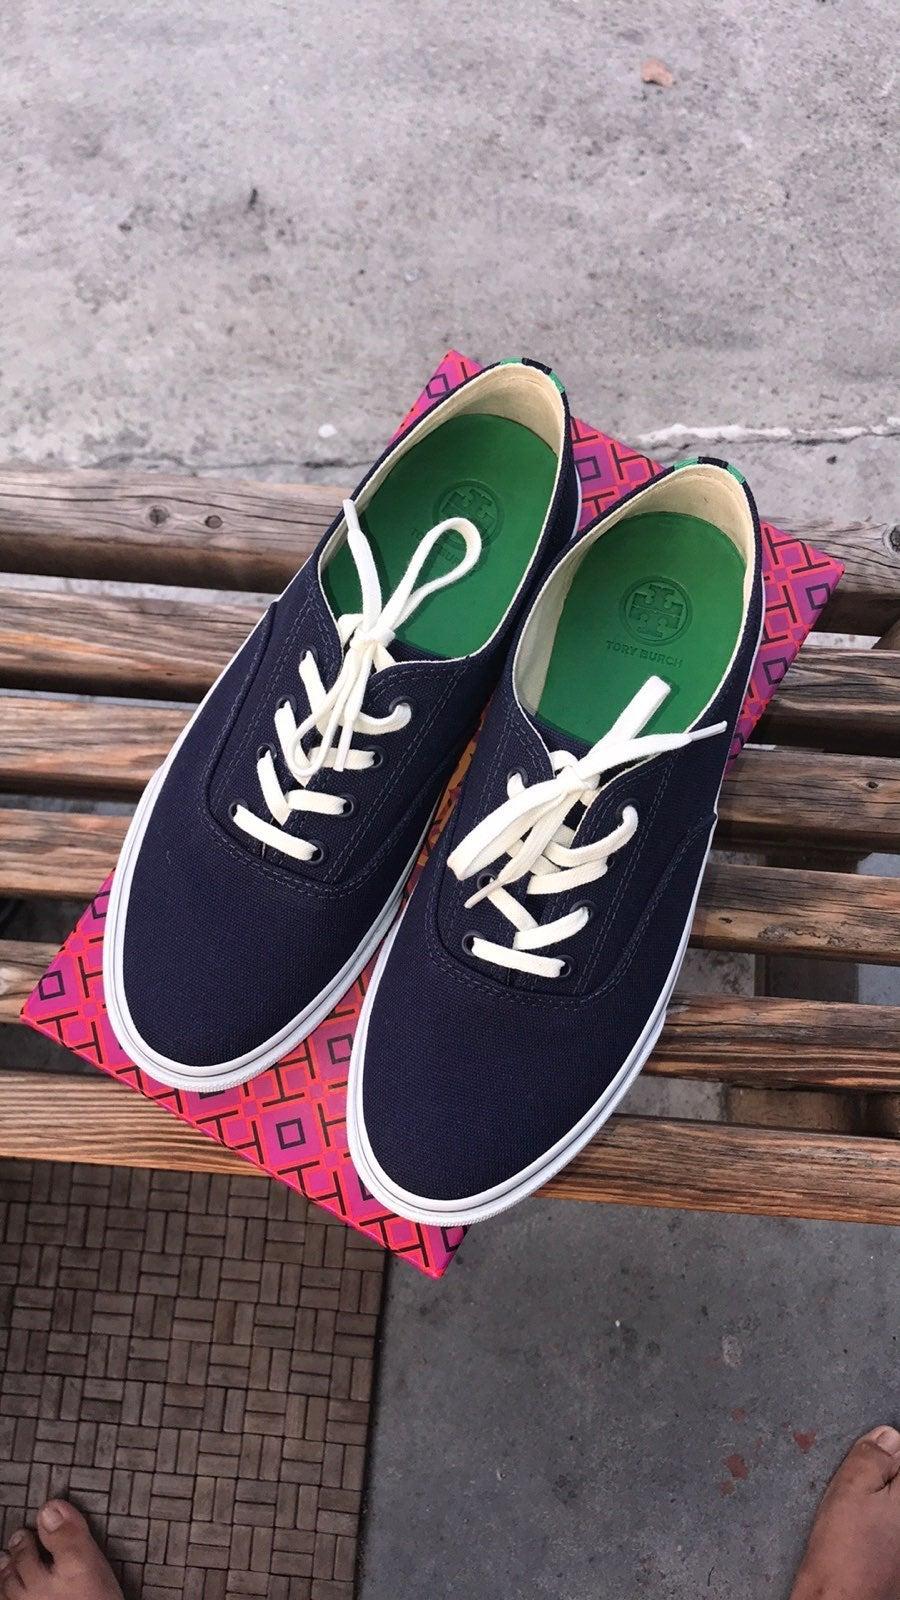 Tory Burch Murray Sneakers